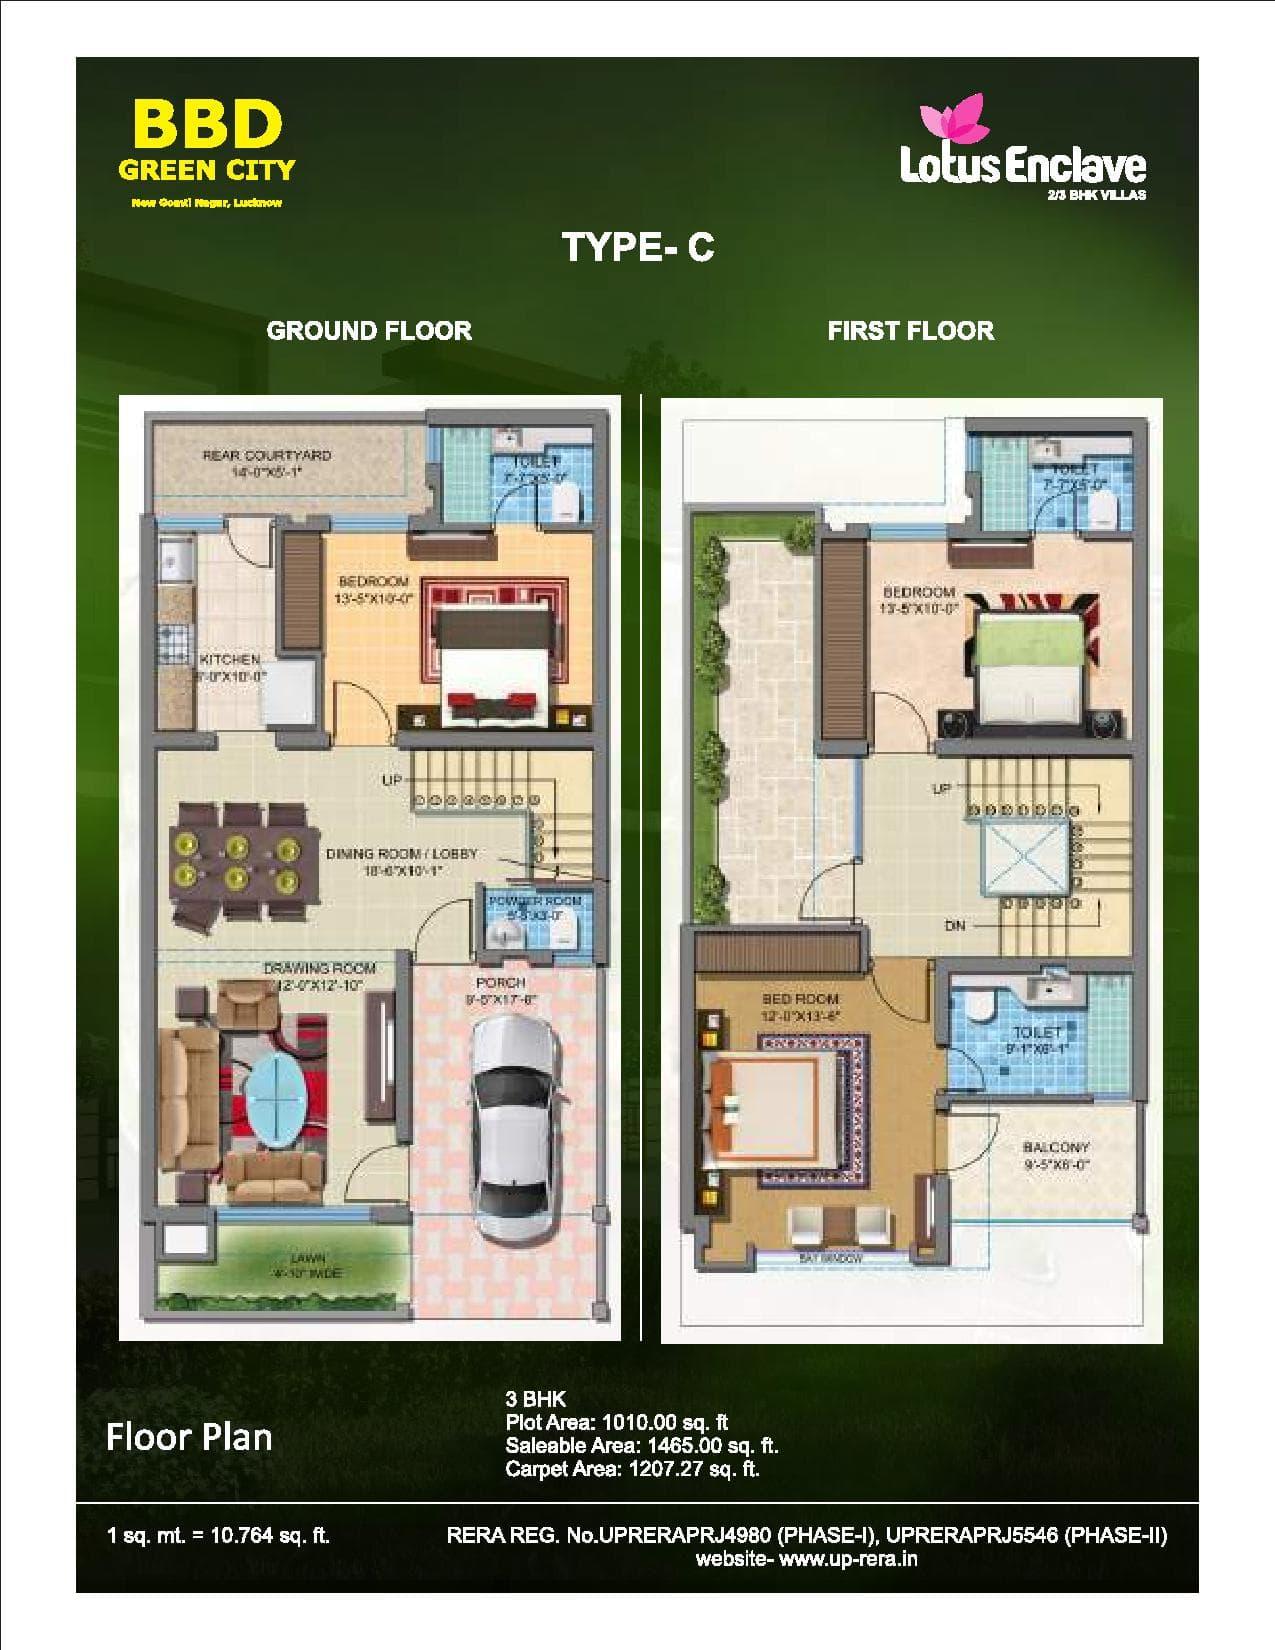 Lotus Enclave Type C Ground Floor